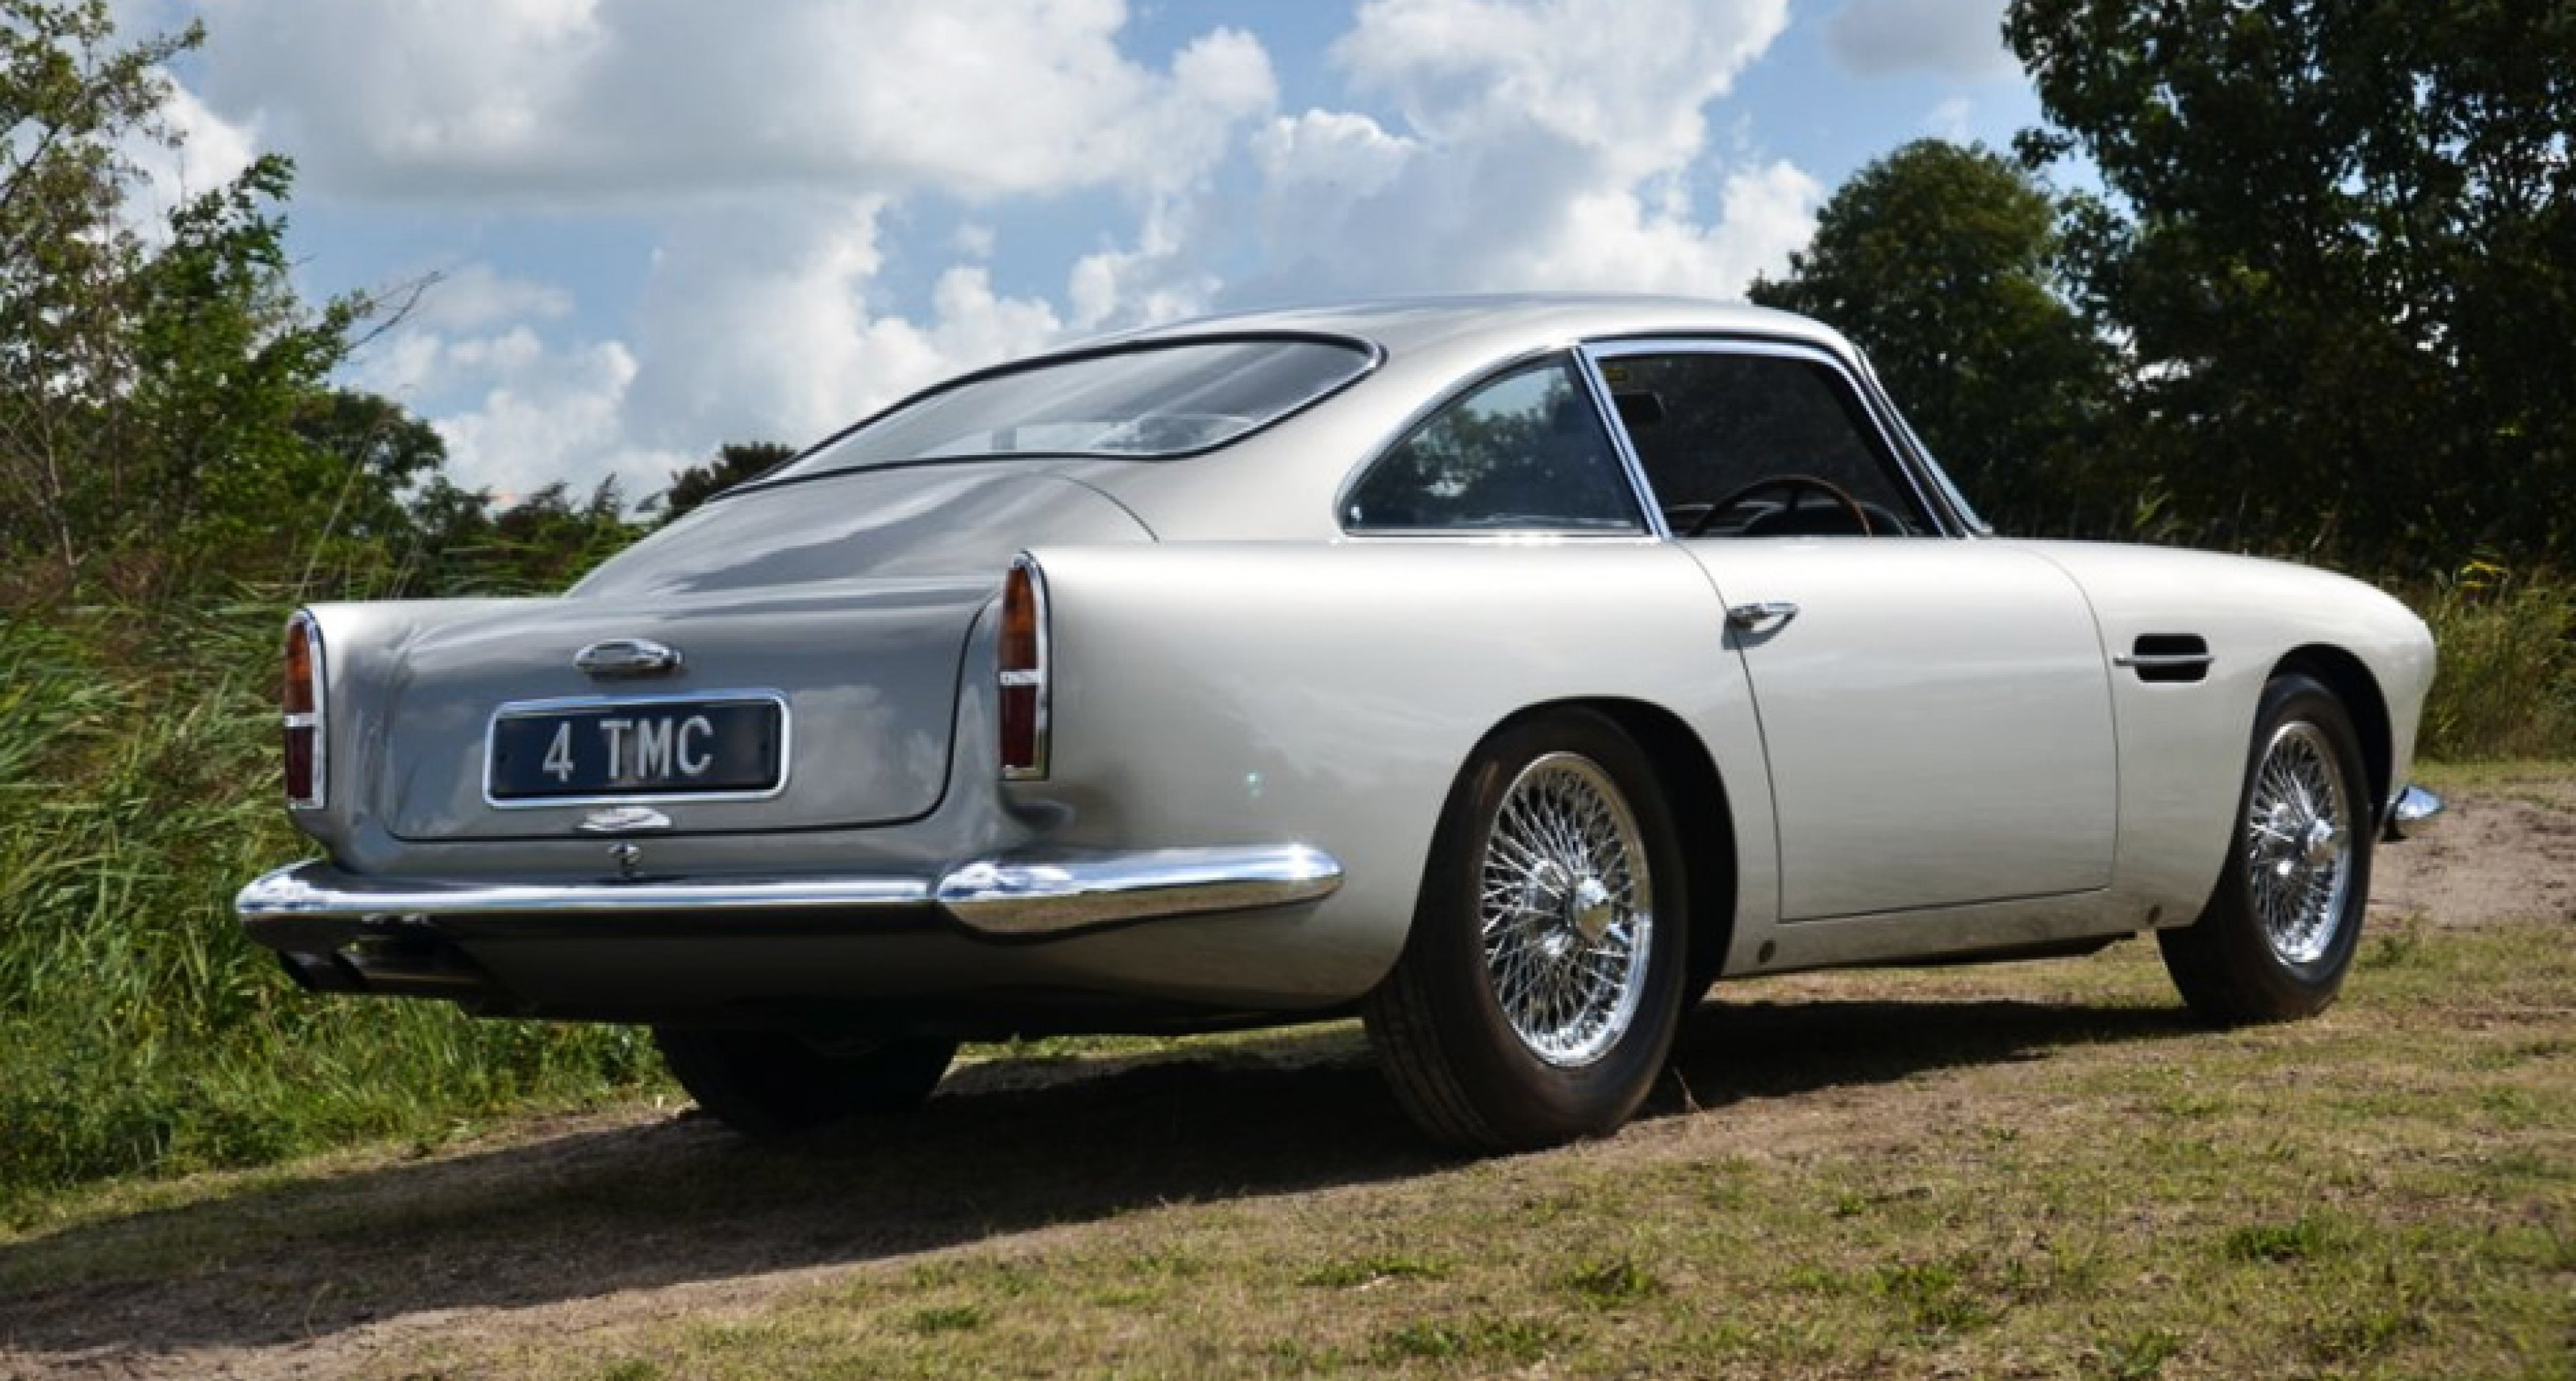 1958 Aston Martin DB4 Chassis 1